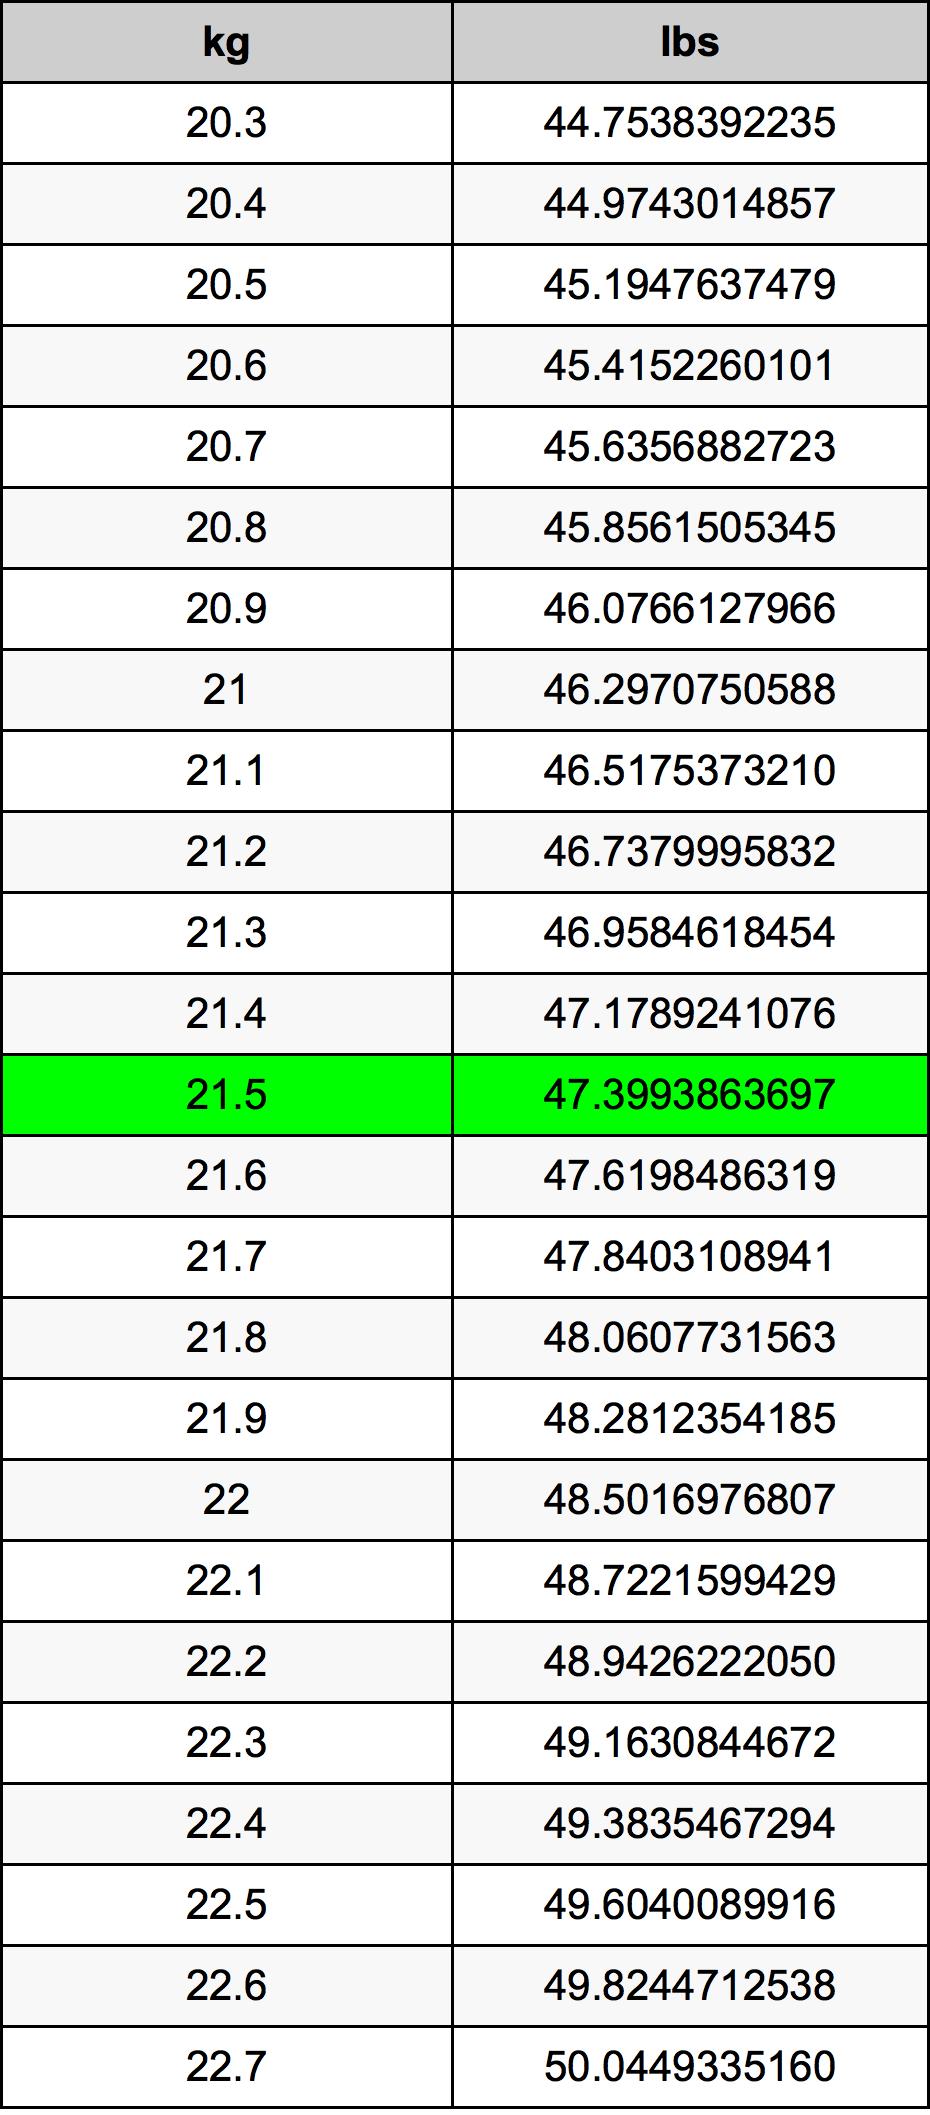 21.5 Kilogramme Table